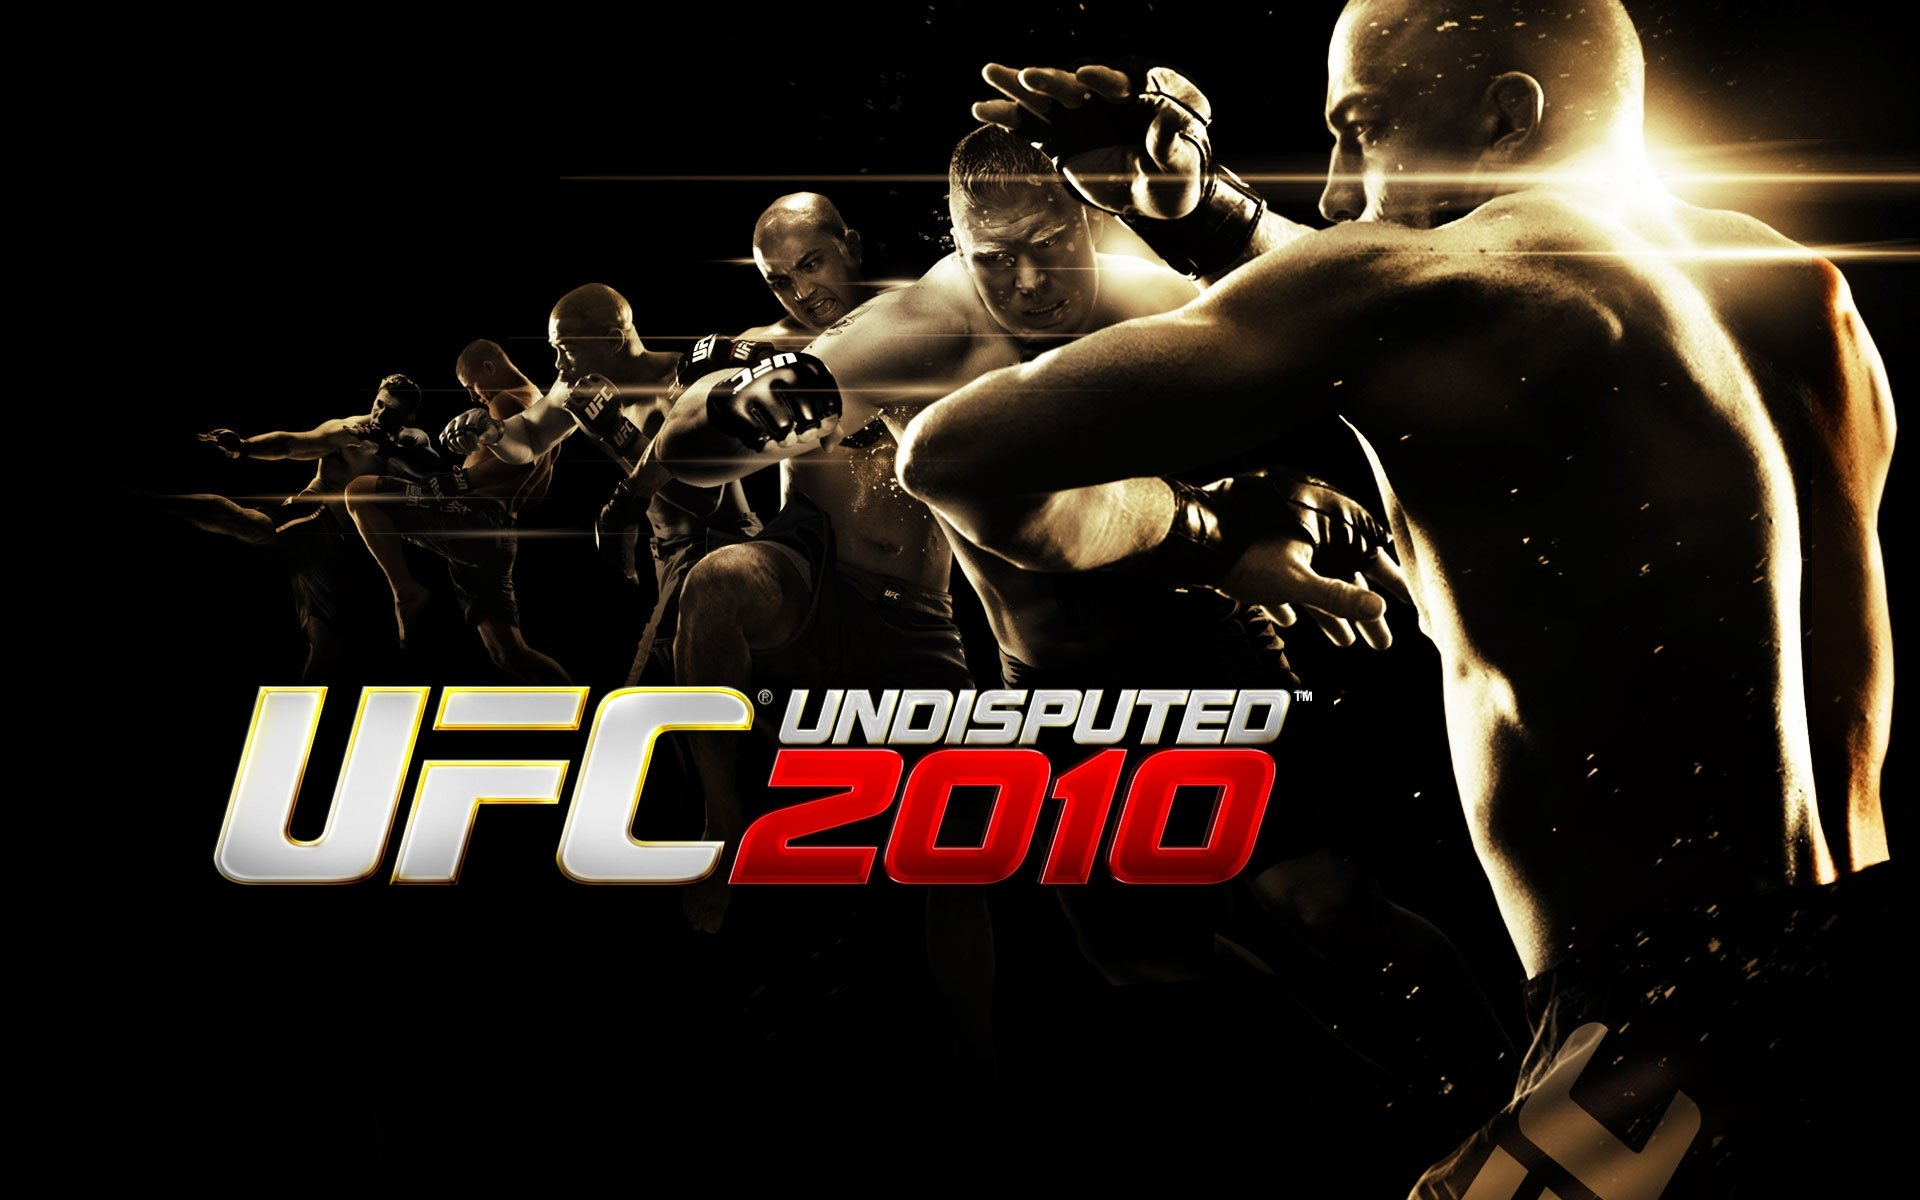 Обои по игре UFC Undisputed 2010